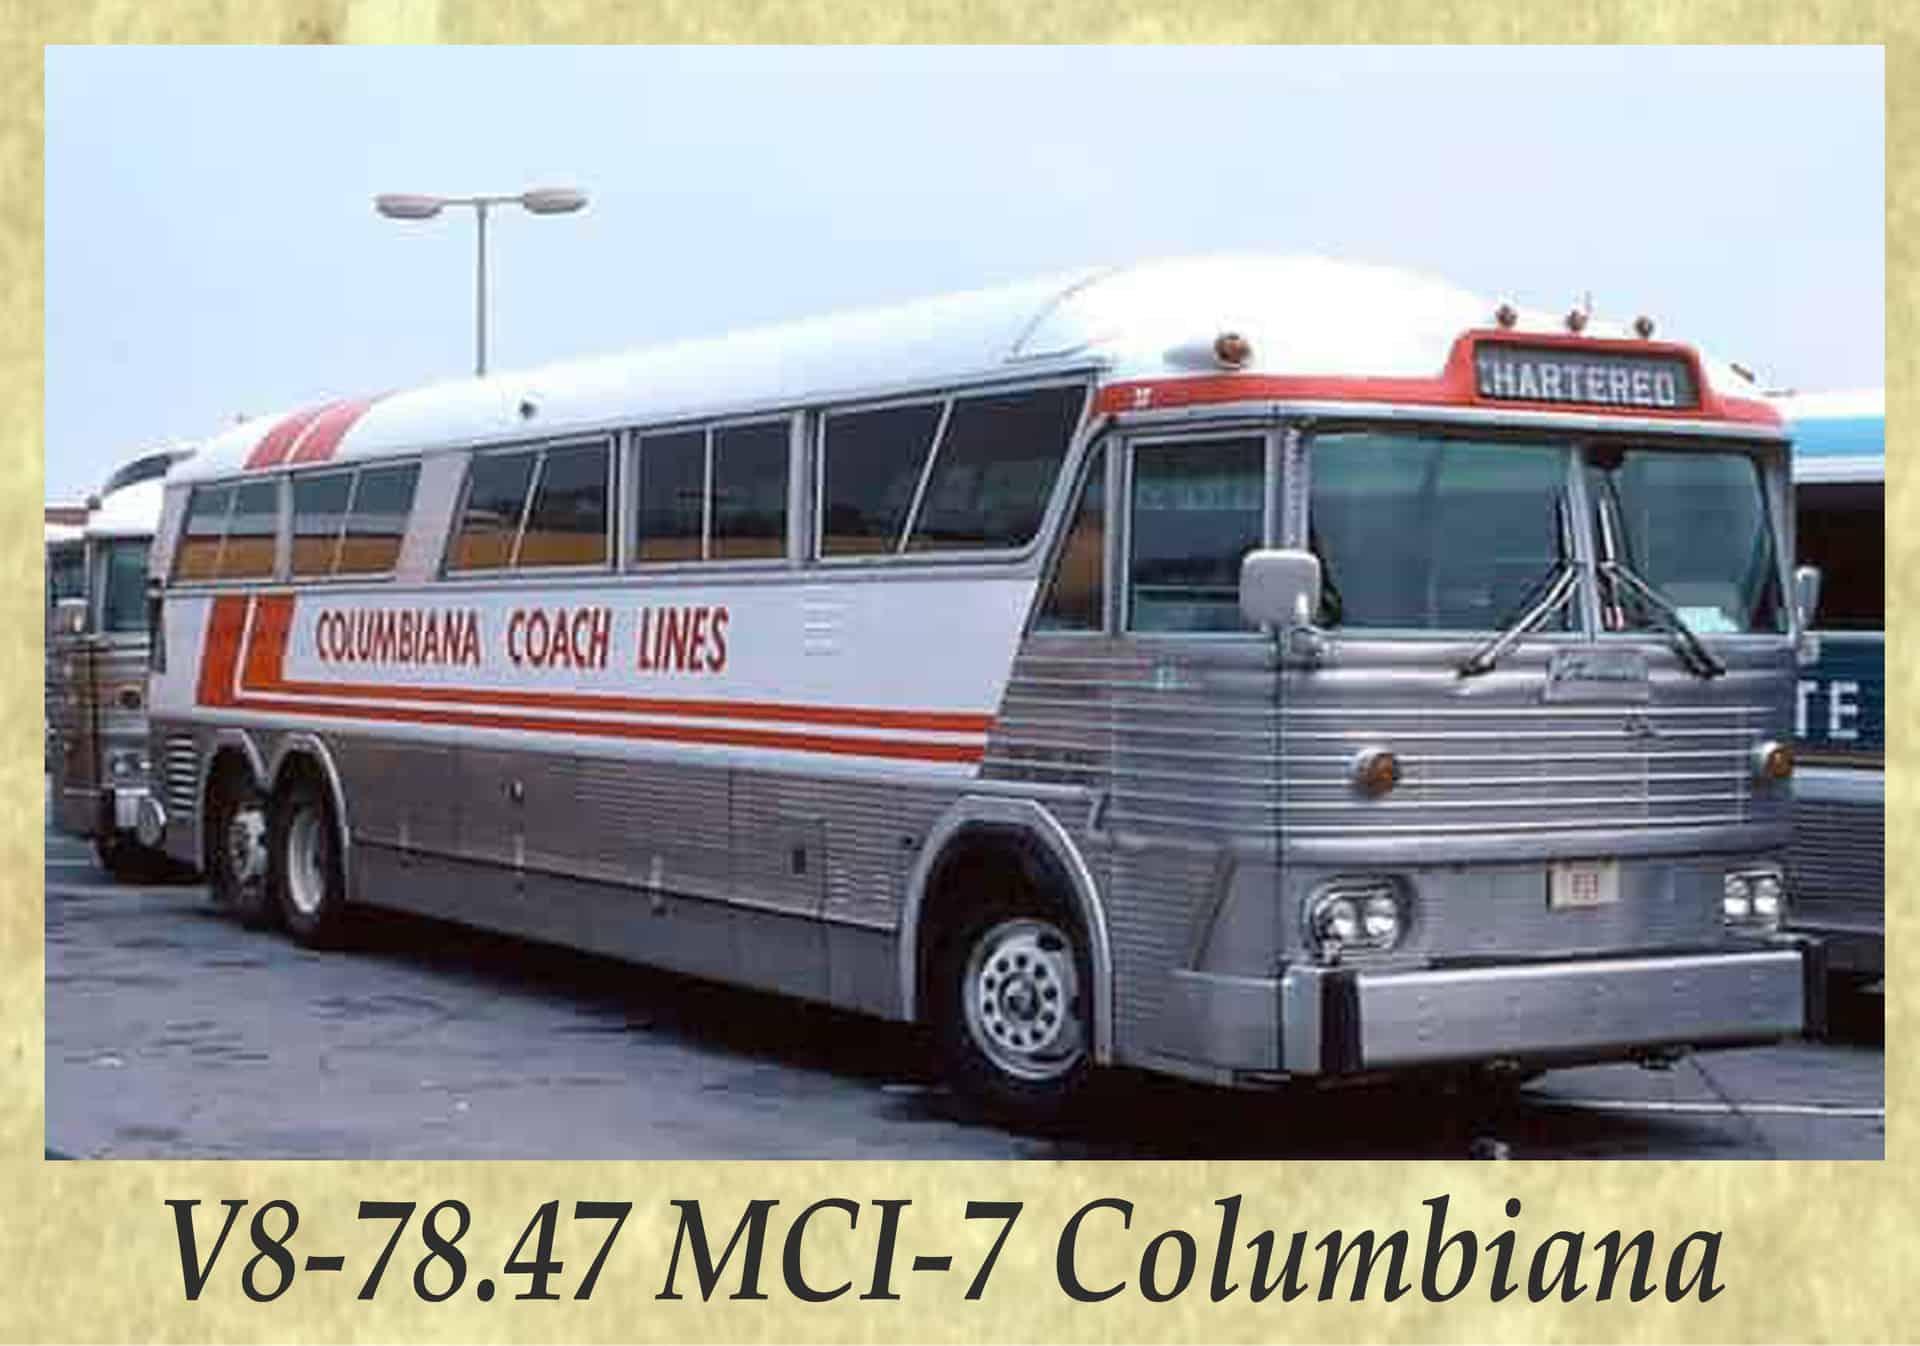 V8-78.47 MCI-7 Columbiana